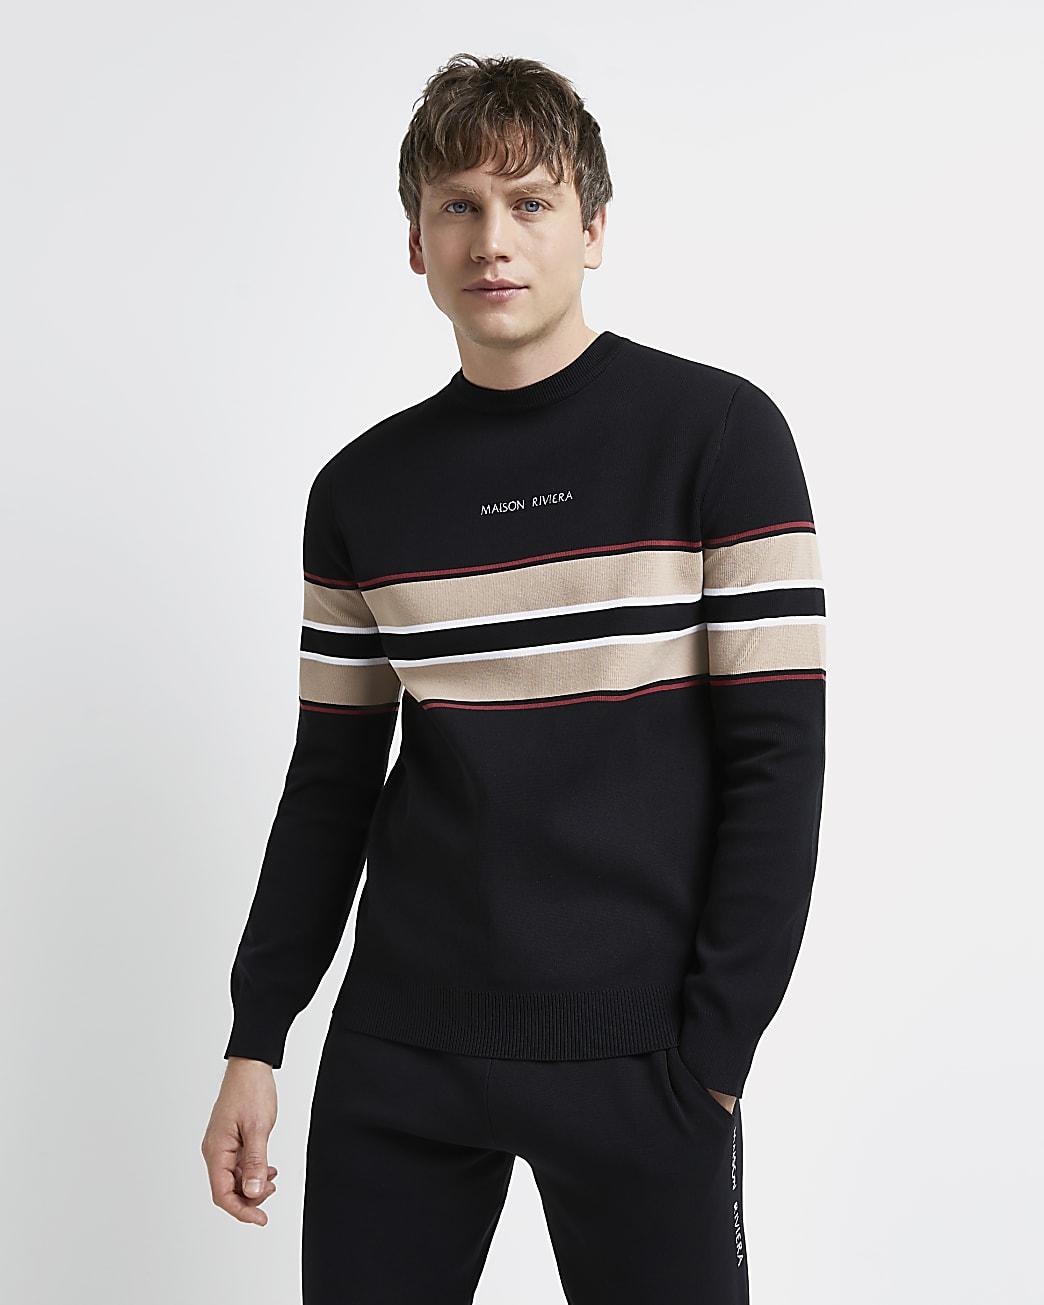 Maison Riviera black slim fit block jumper